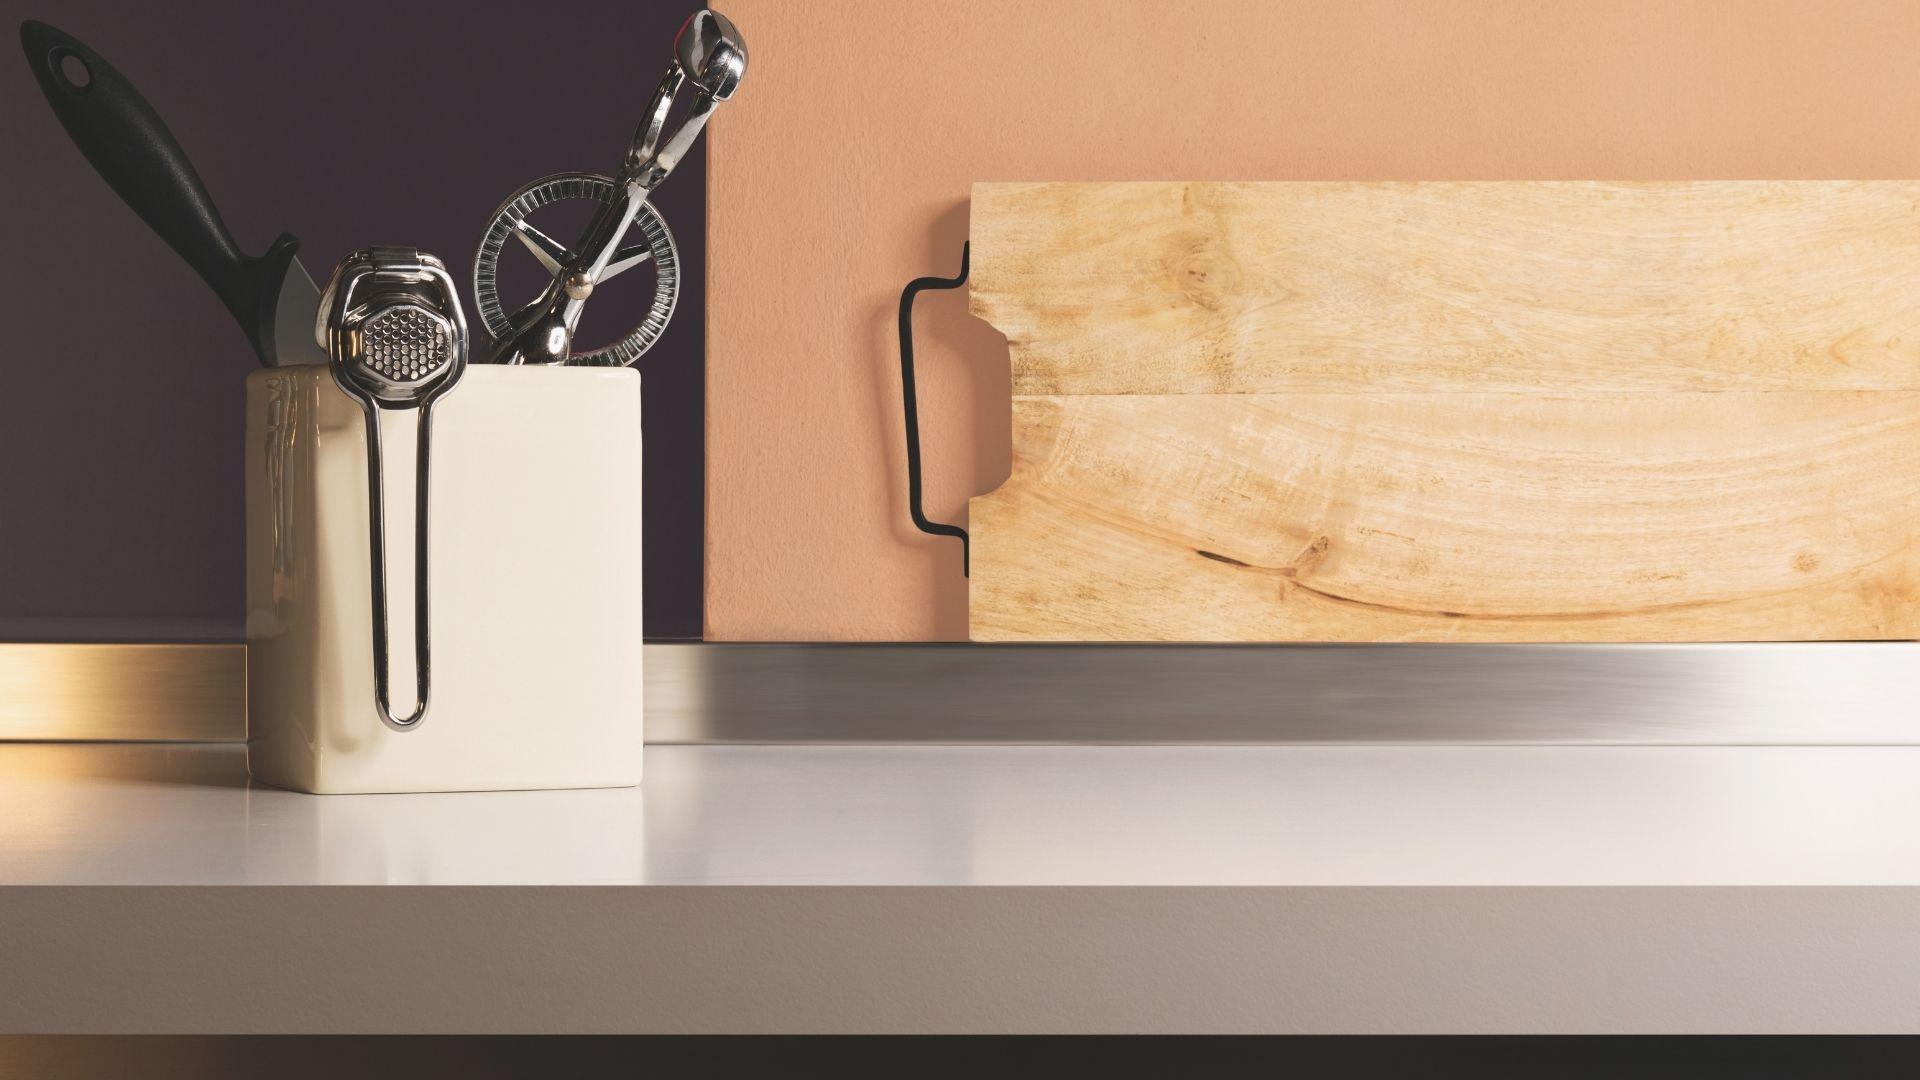 deska do krojenia chleba drewniana